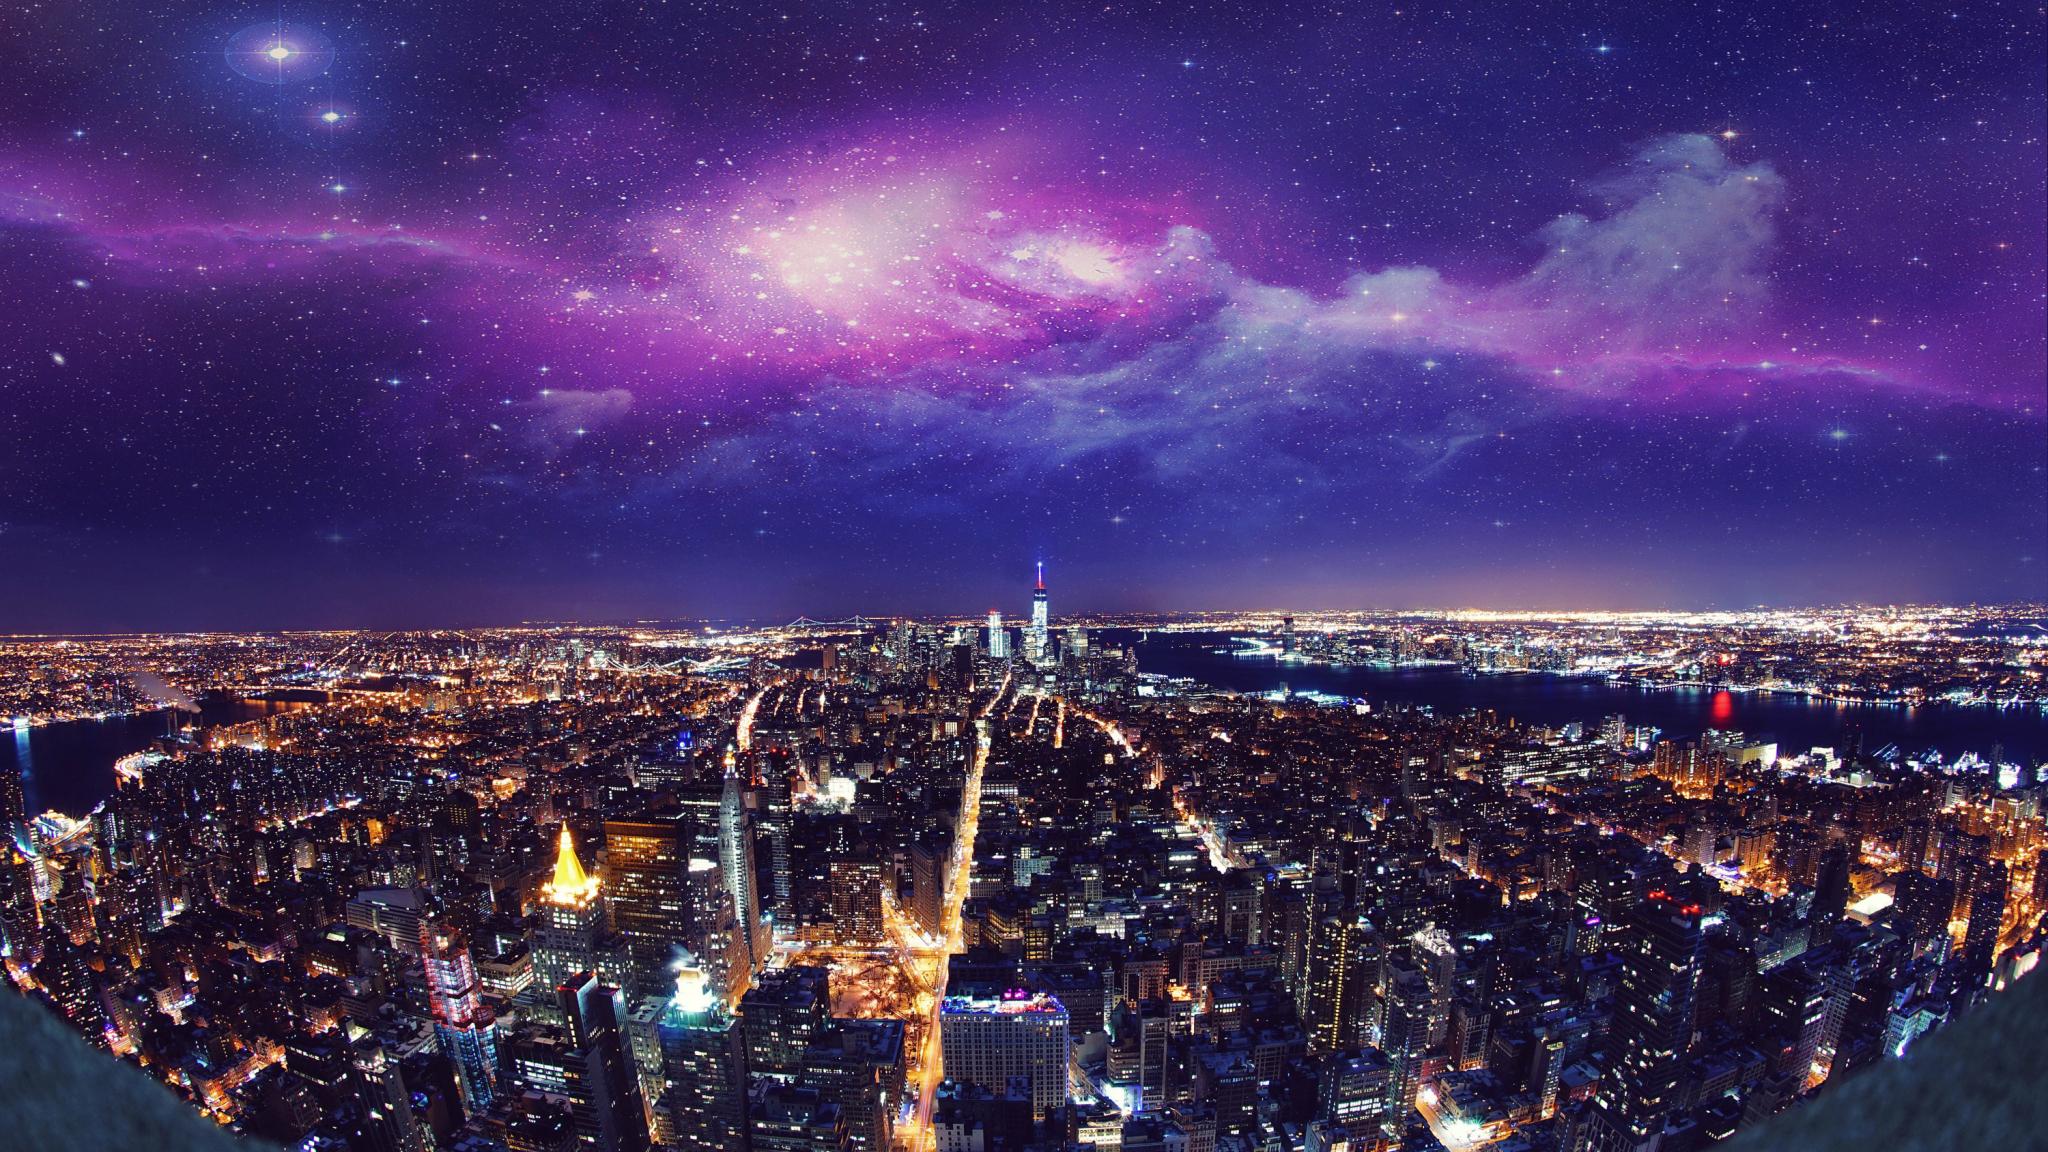 Wallpaper Usa New York City Night 4k 2048x1152 Download Hd Wallpaper Wallpapertip